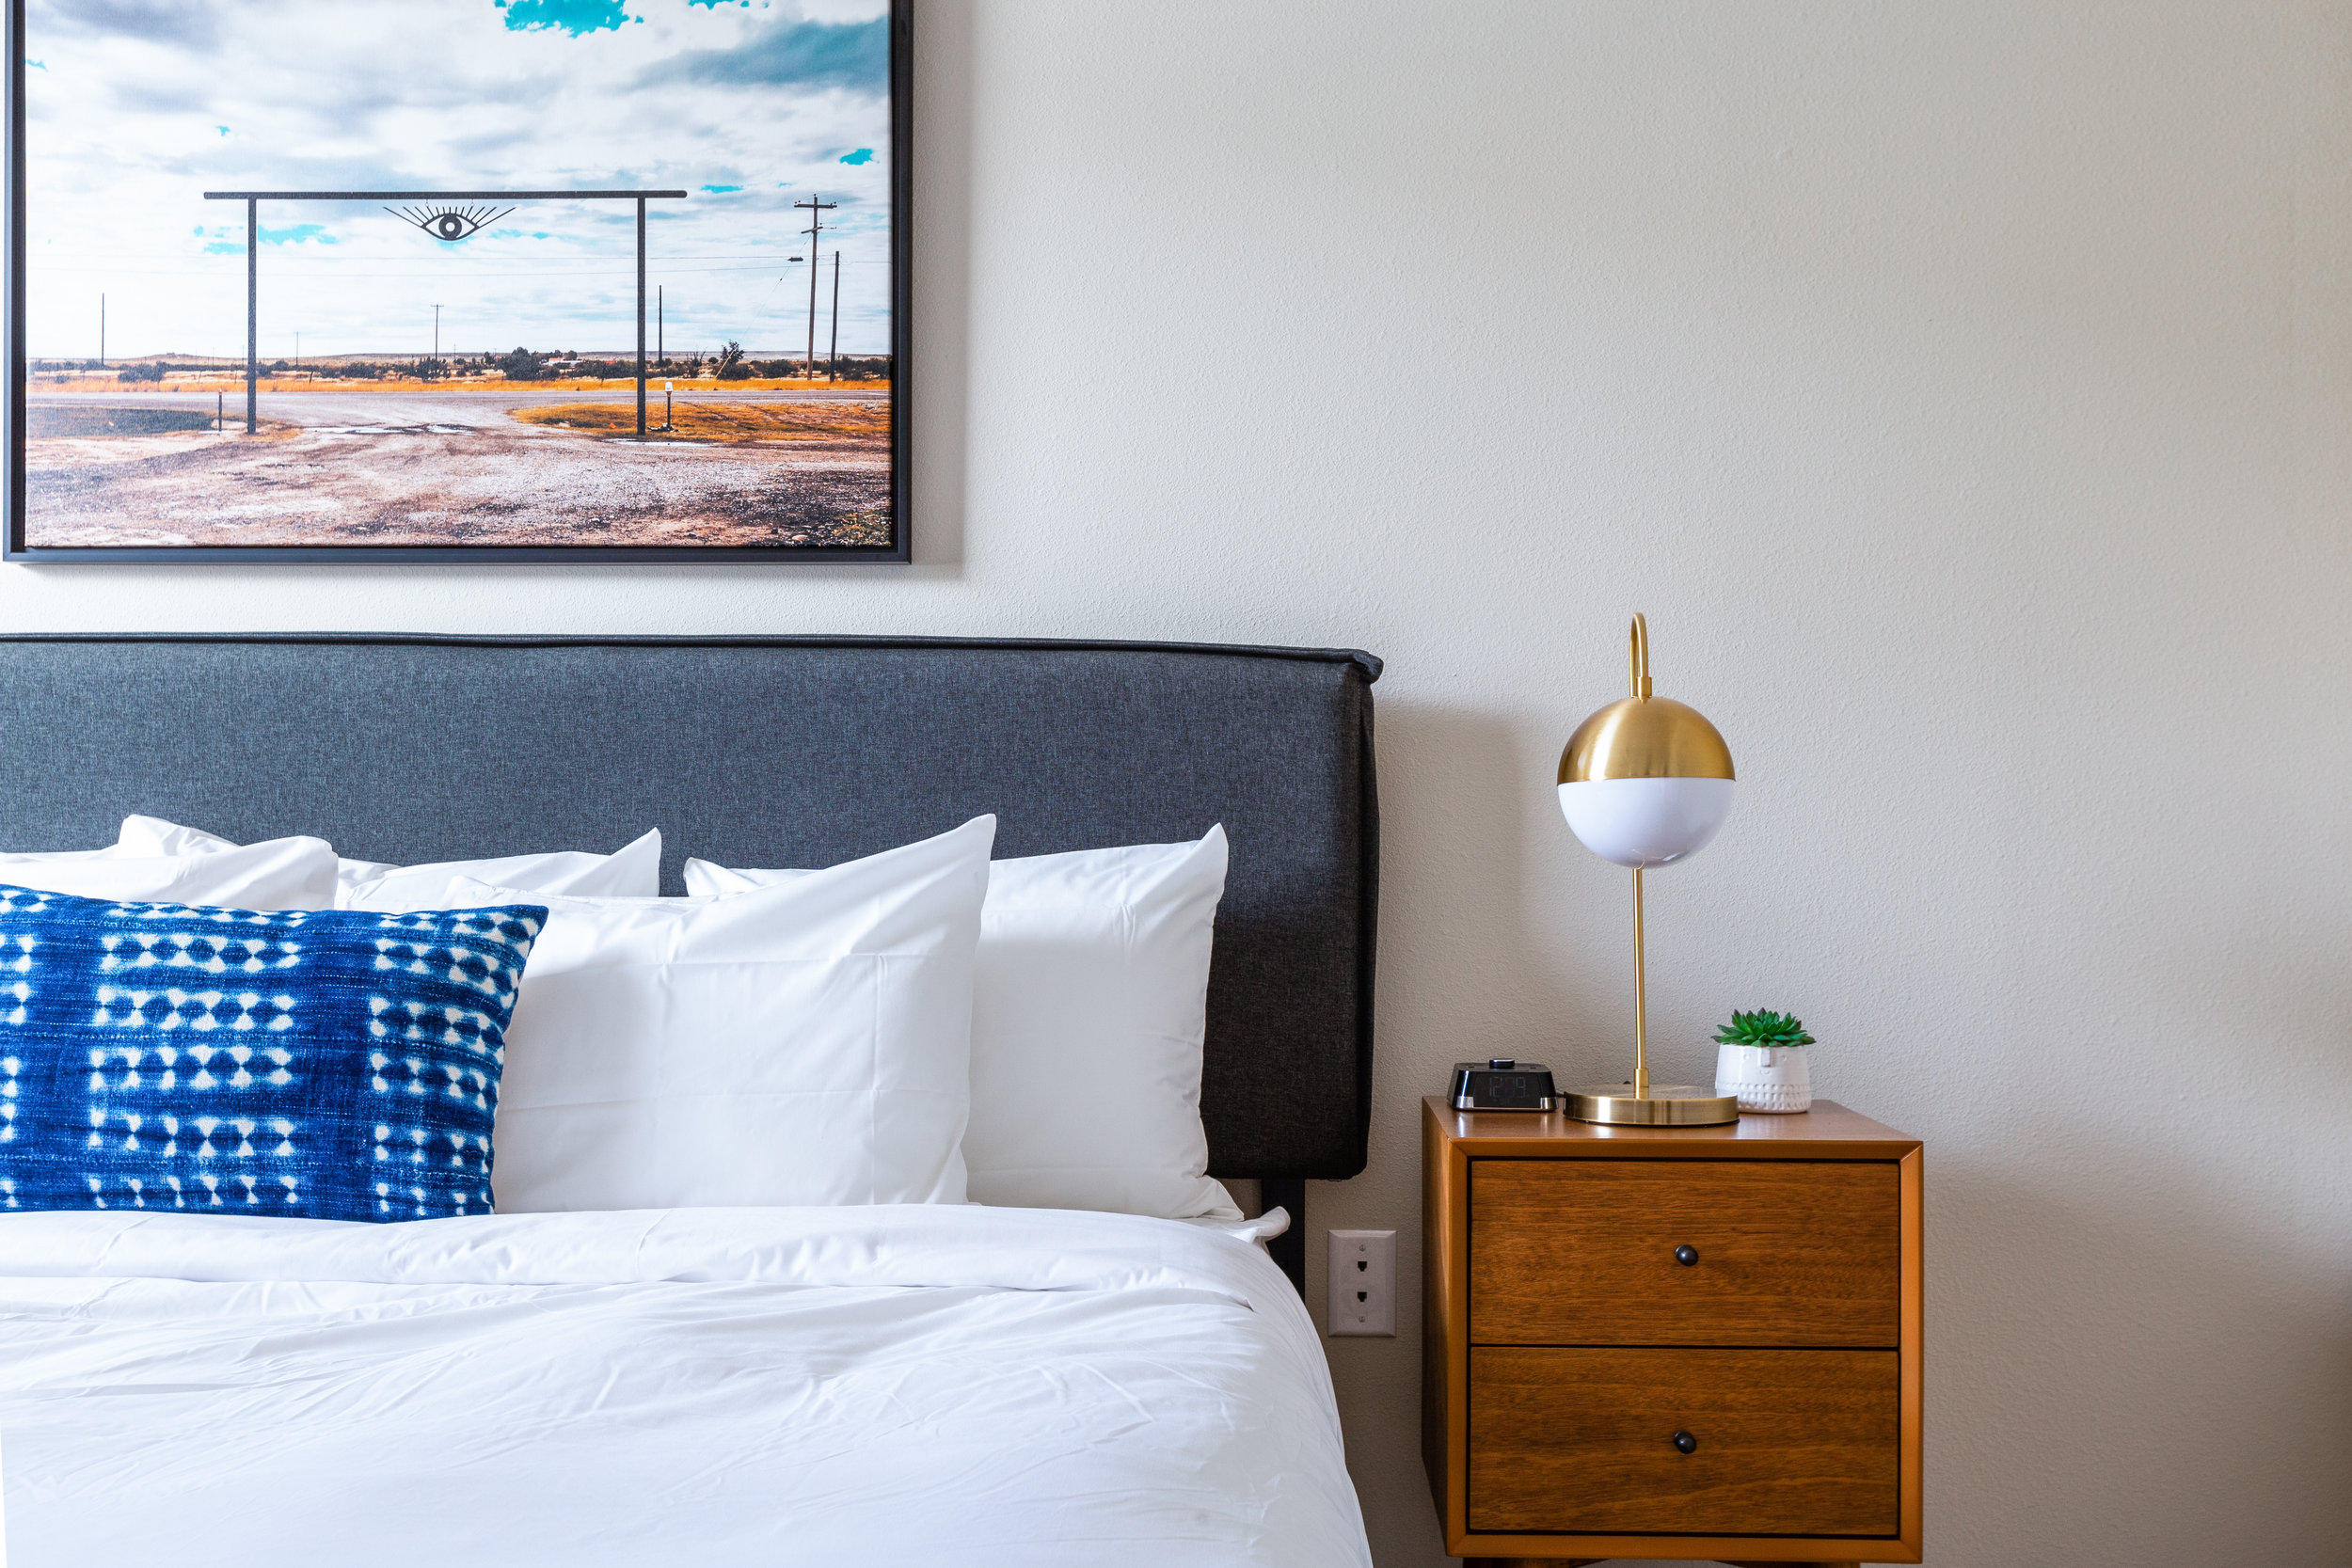 Modern-Neutral-Bedroom-Interior-Design-Love-Ding-Locale-Behind-The-Scenes.jpg